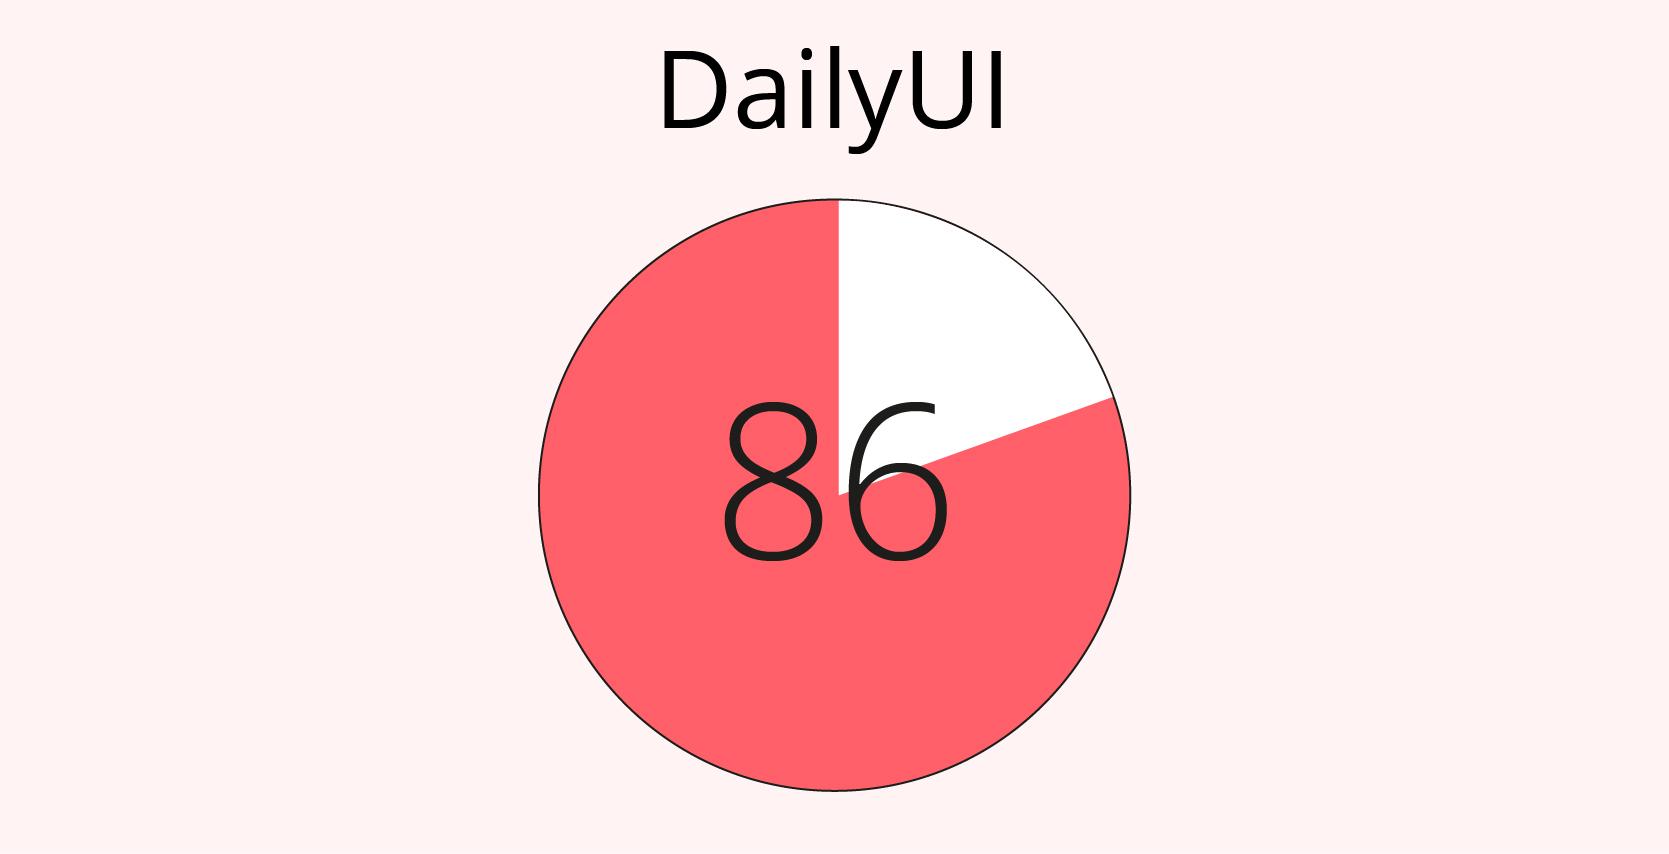 Countdown DailyUI